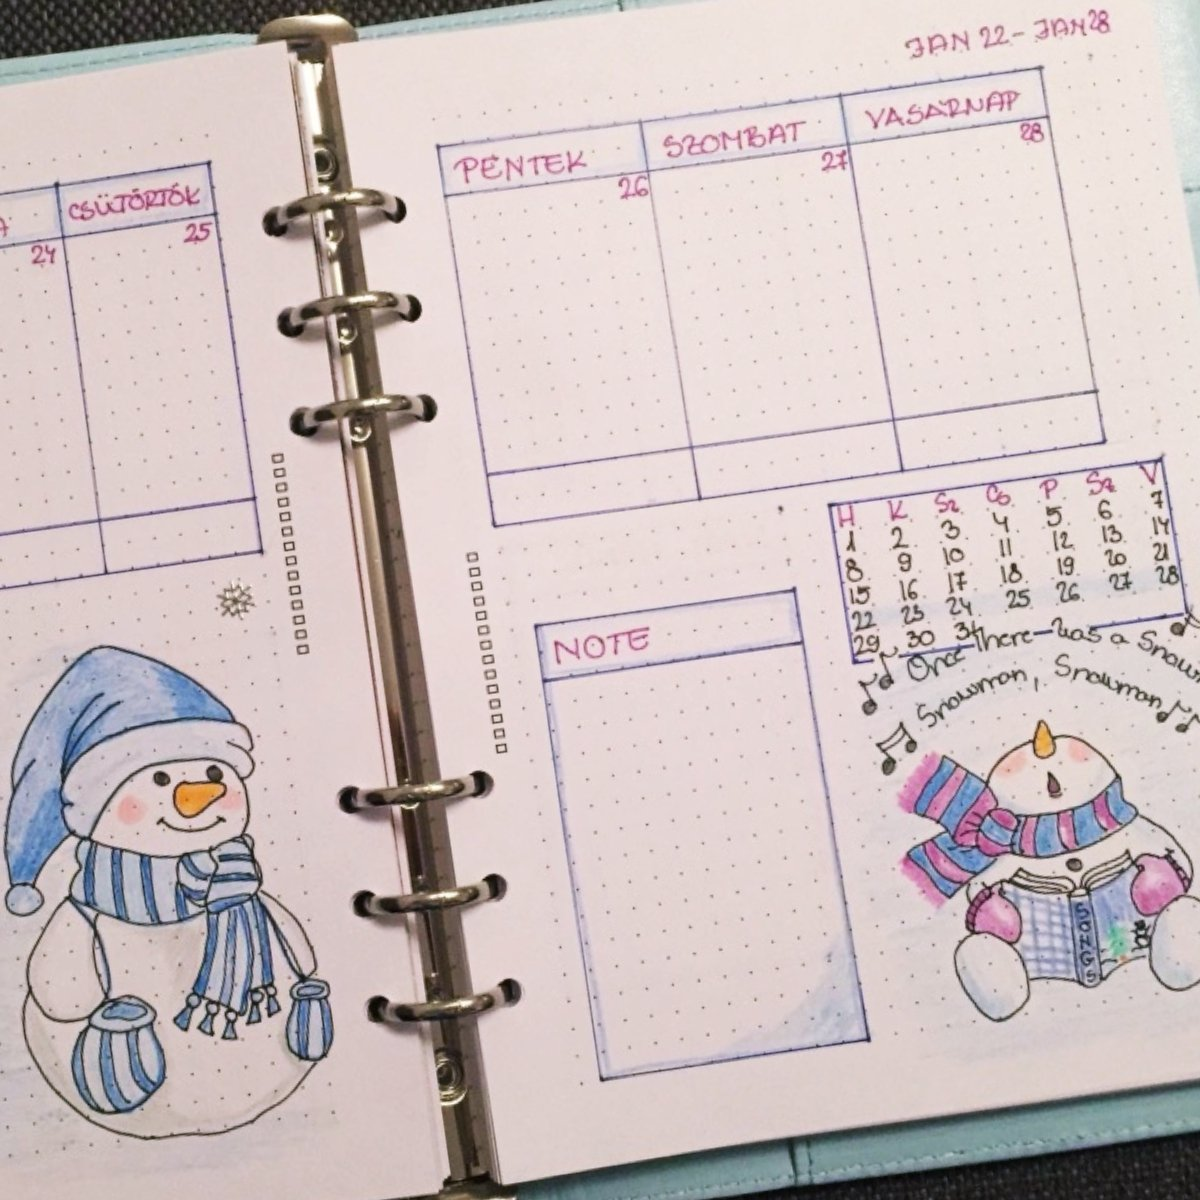 Creative journal weekly planner - week 4 - itstartswithacoffee.com #creativejournaling #weekly #weeklyplanner #2018 #january #2018January #planner